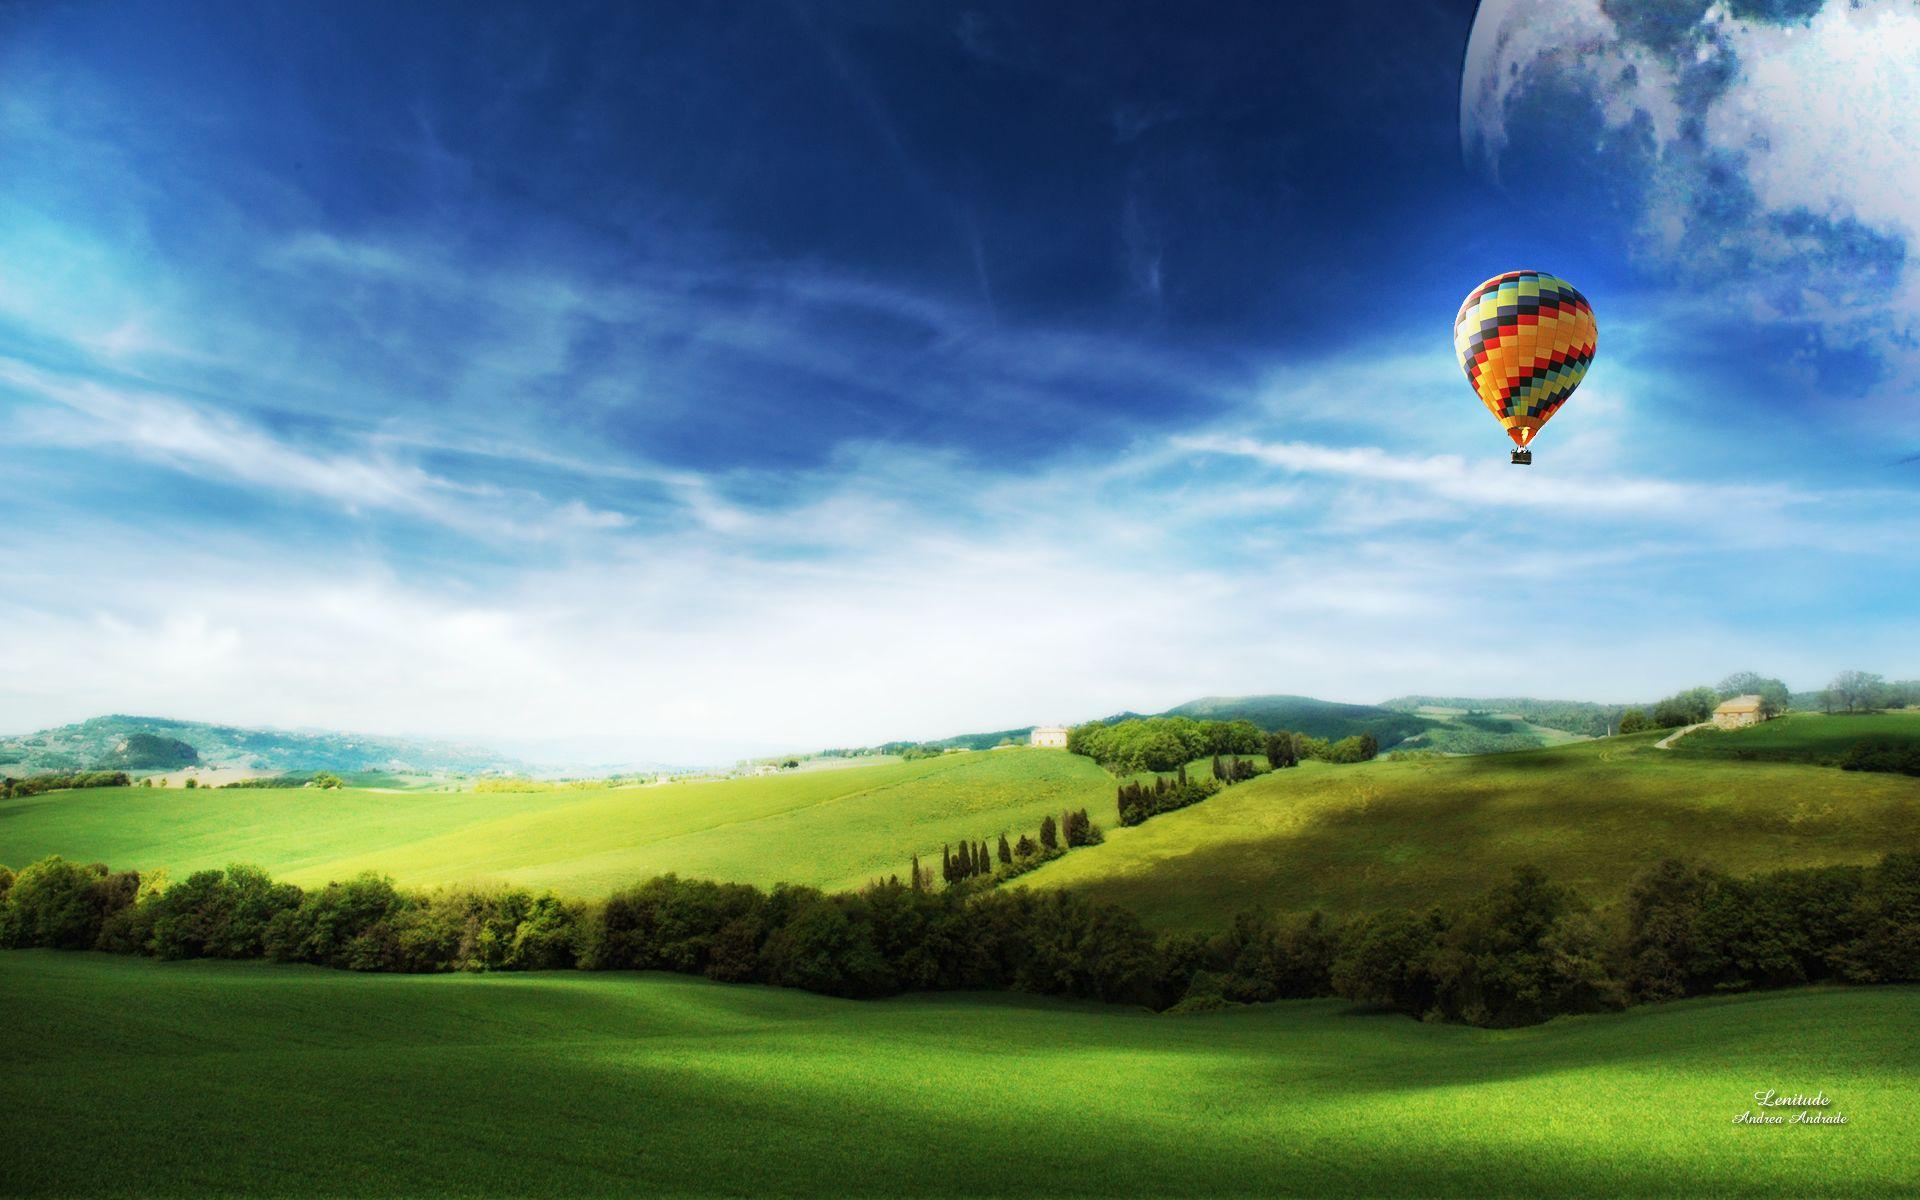 природа деревья архитектура мост воздушные шары аэростаты nature trees architecture the bridge air balls balloons  № 2627681 бесплатно